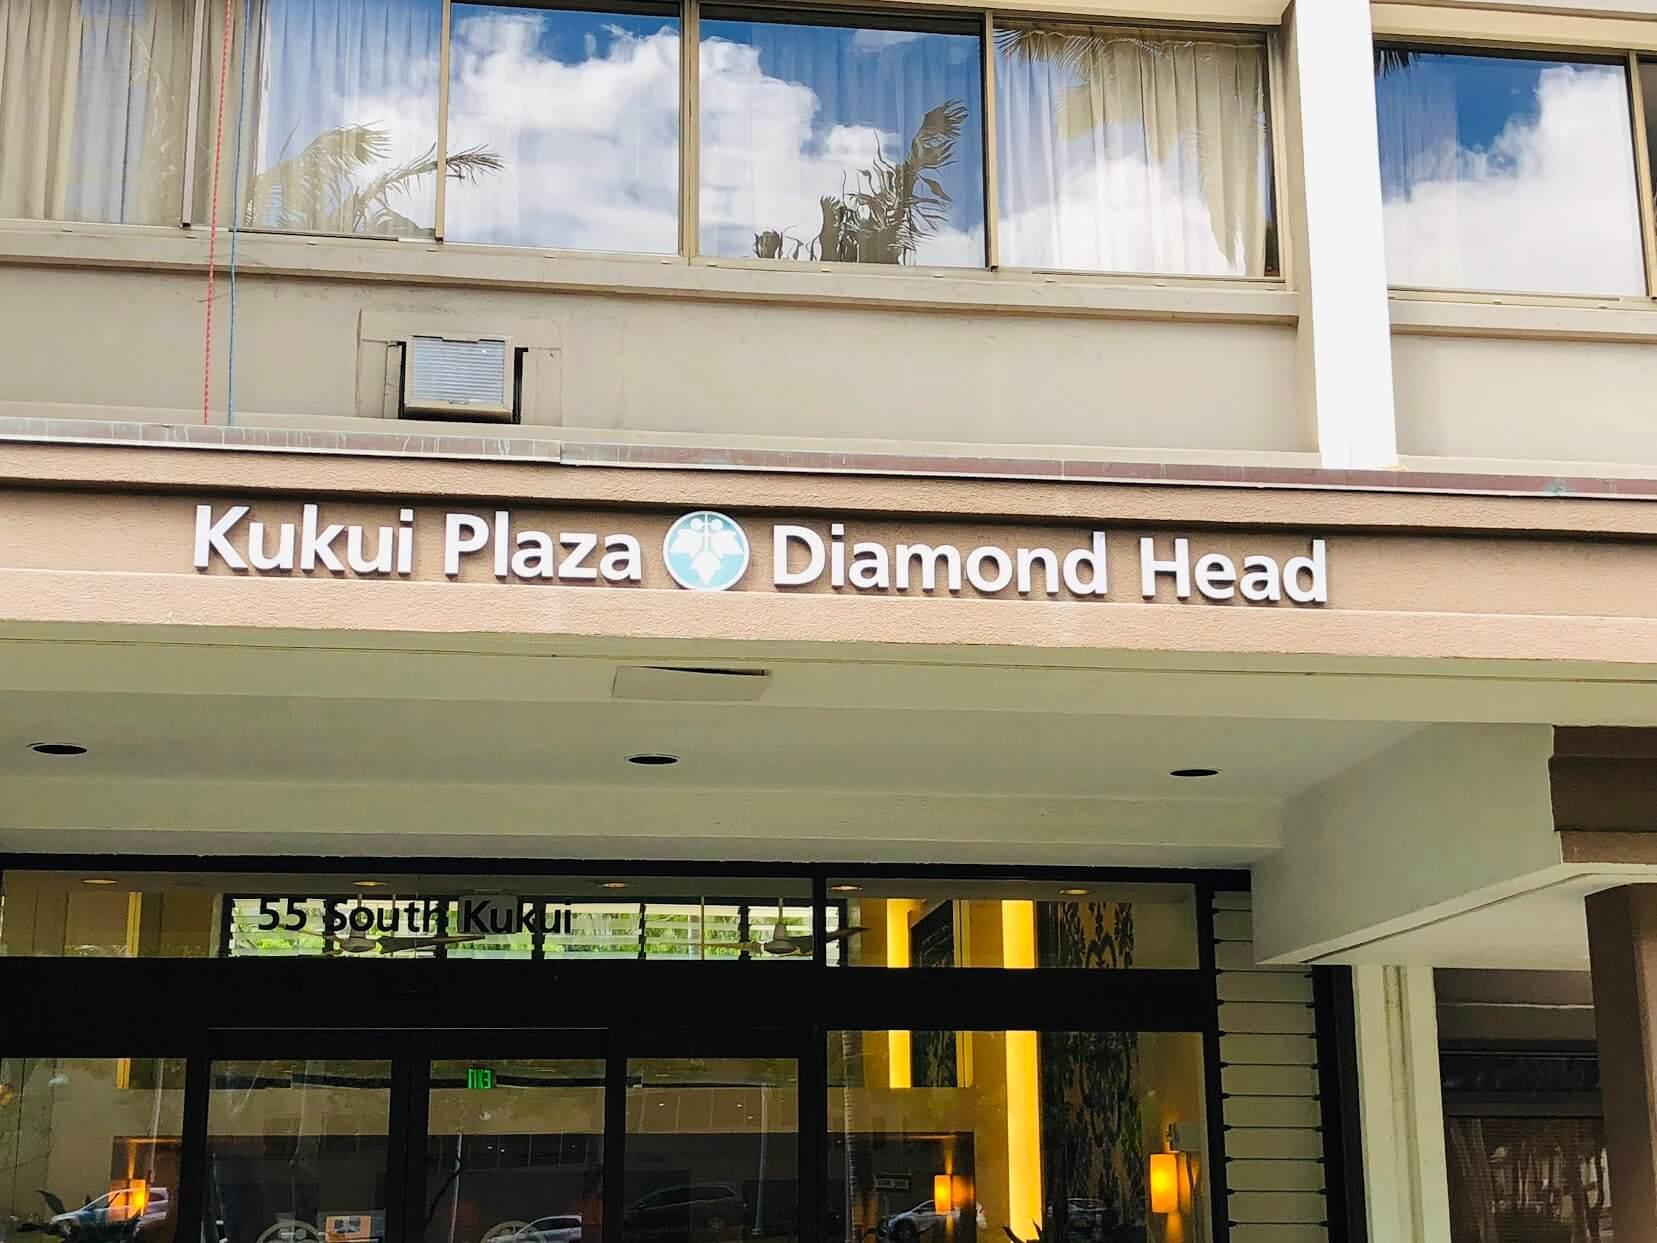 Kukui Plazaの看板